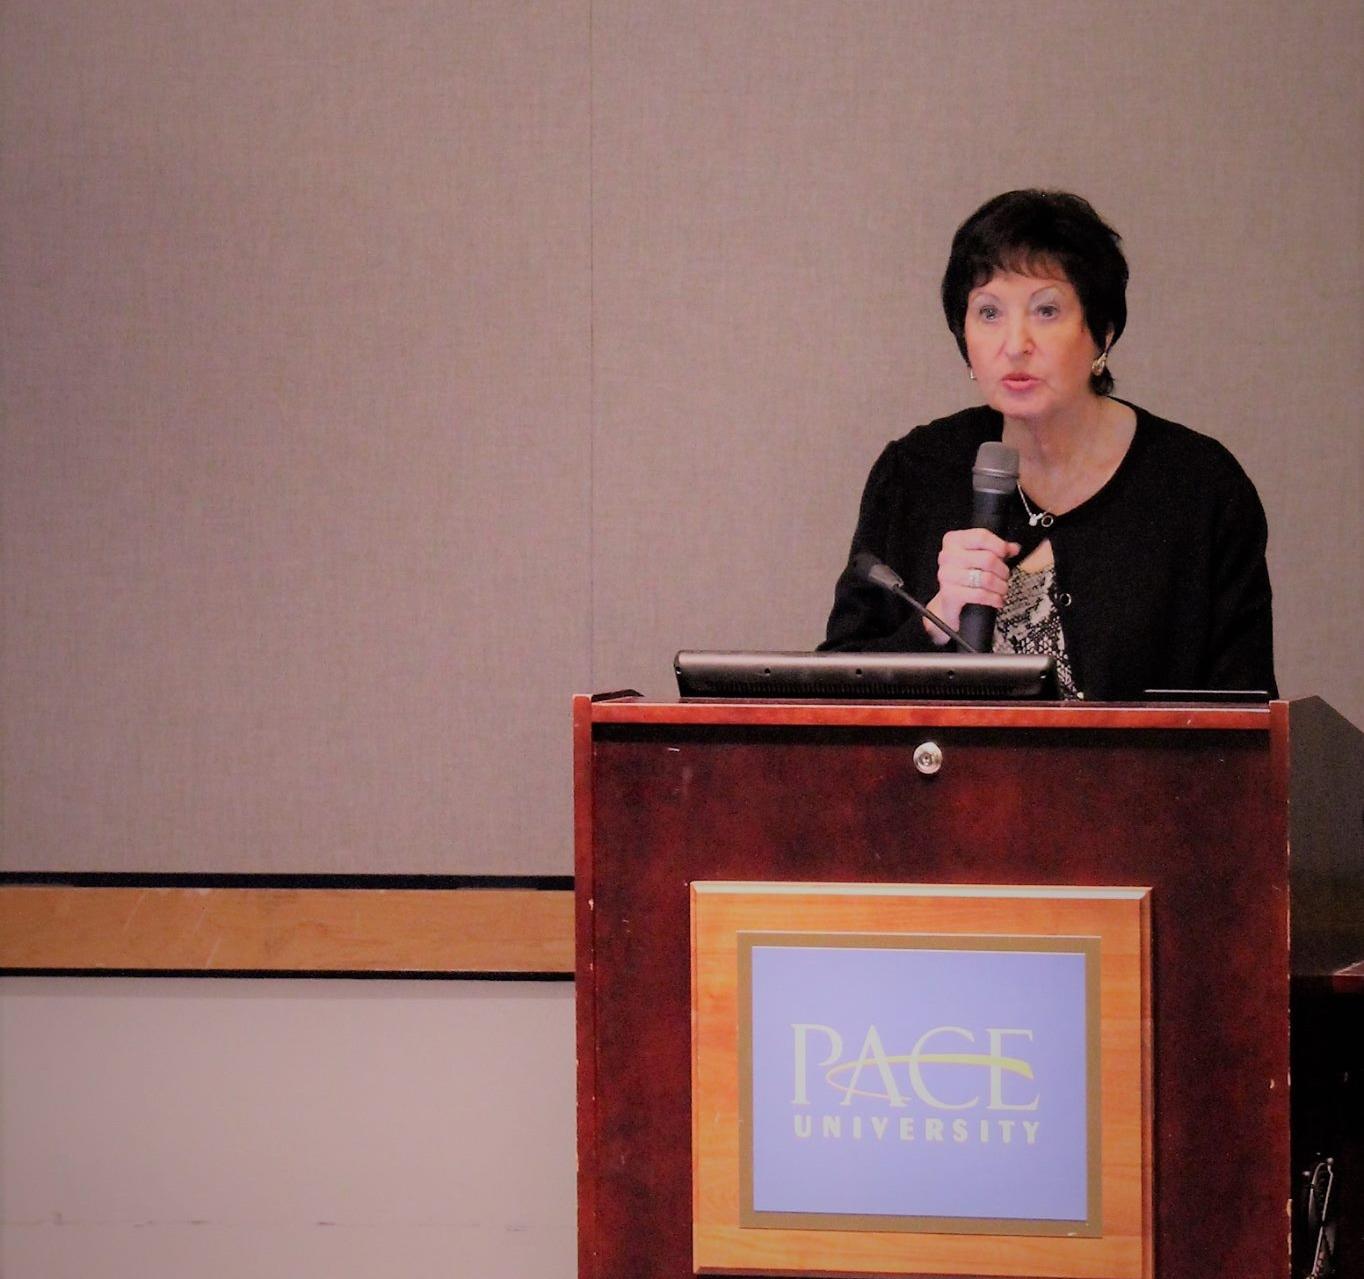 Harriet R. Feldman, PhD, RN, FAAN, Dean of Pace University's College of Health Professions and Lienhard School of Nursing